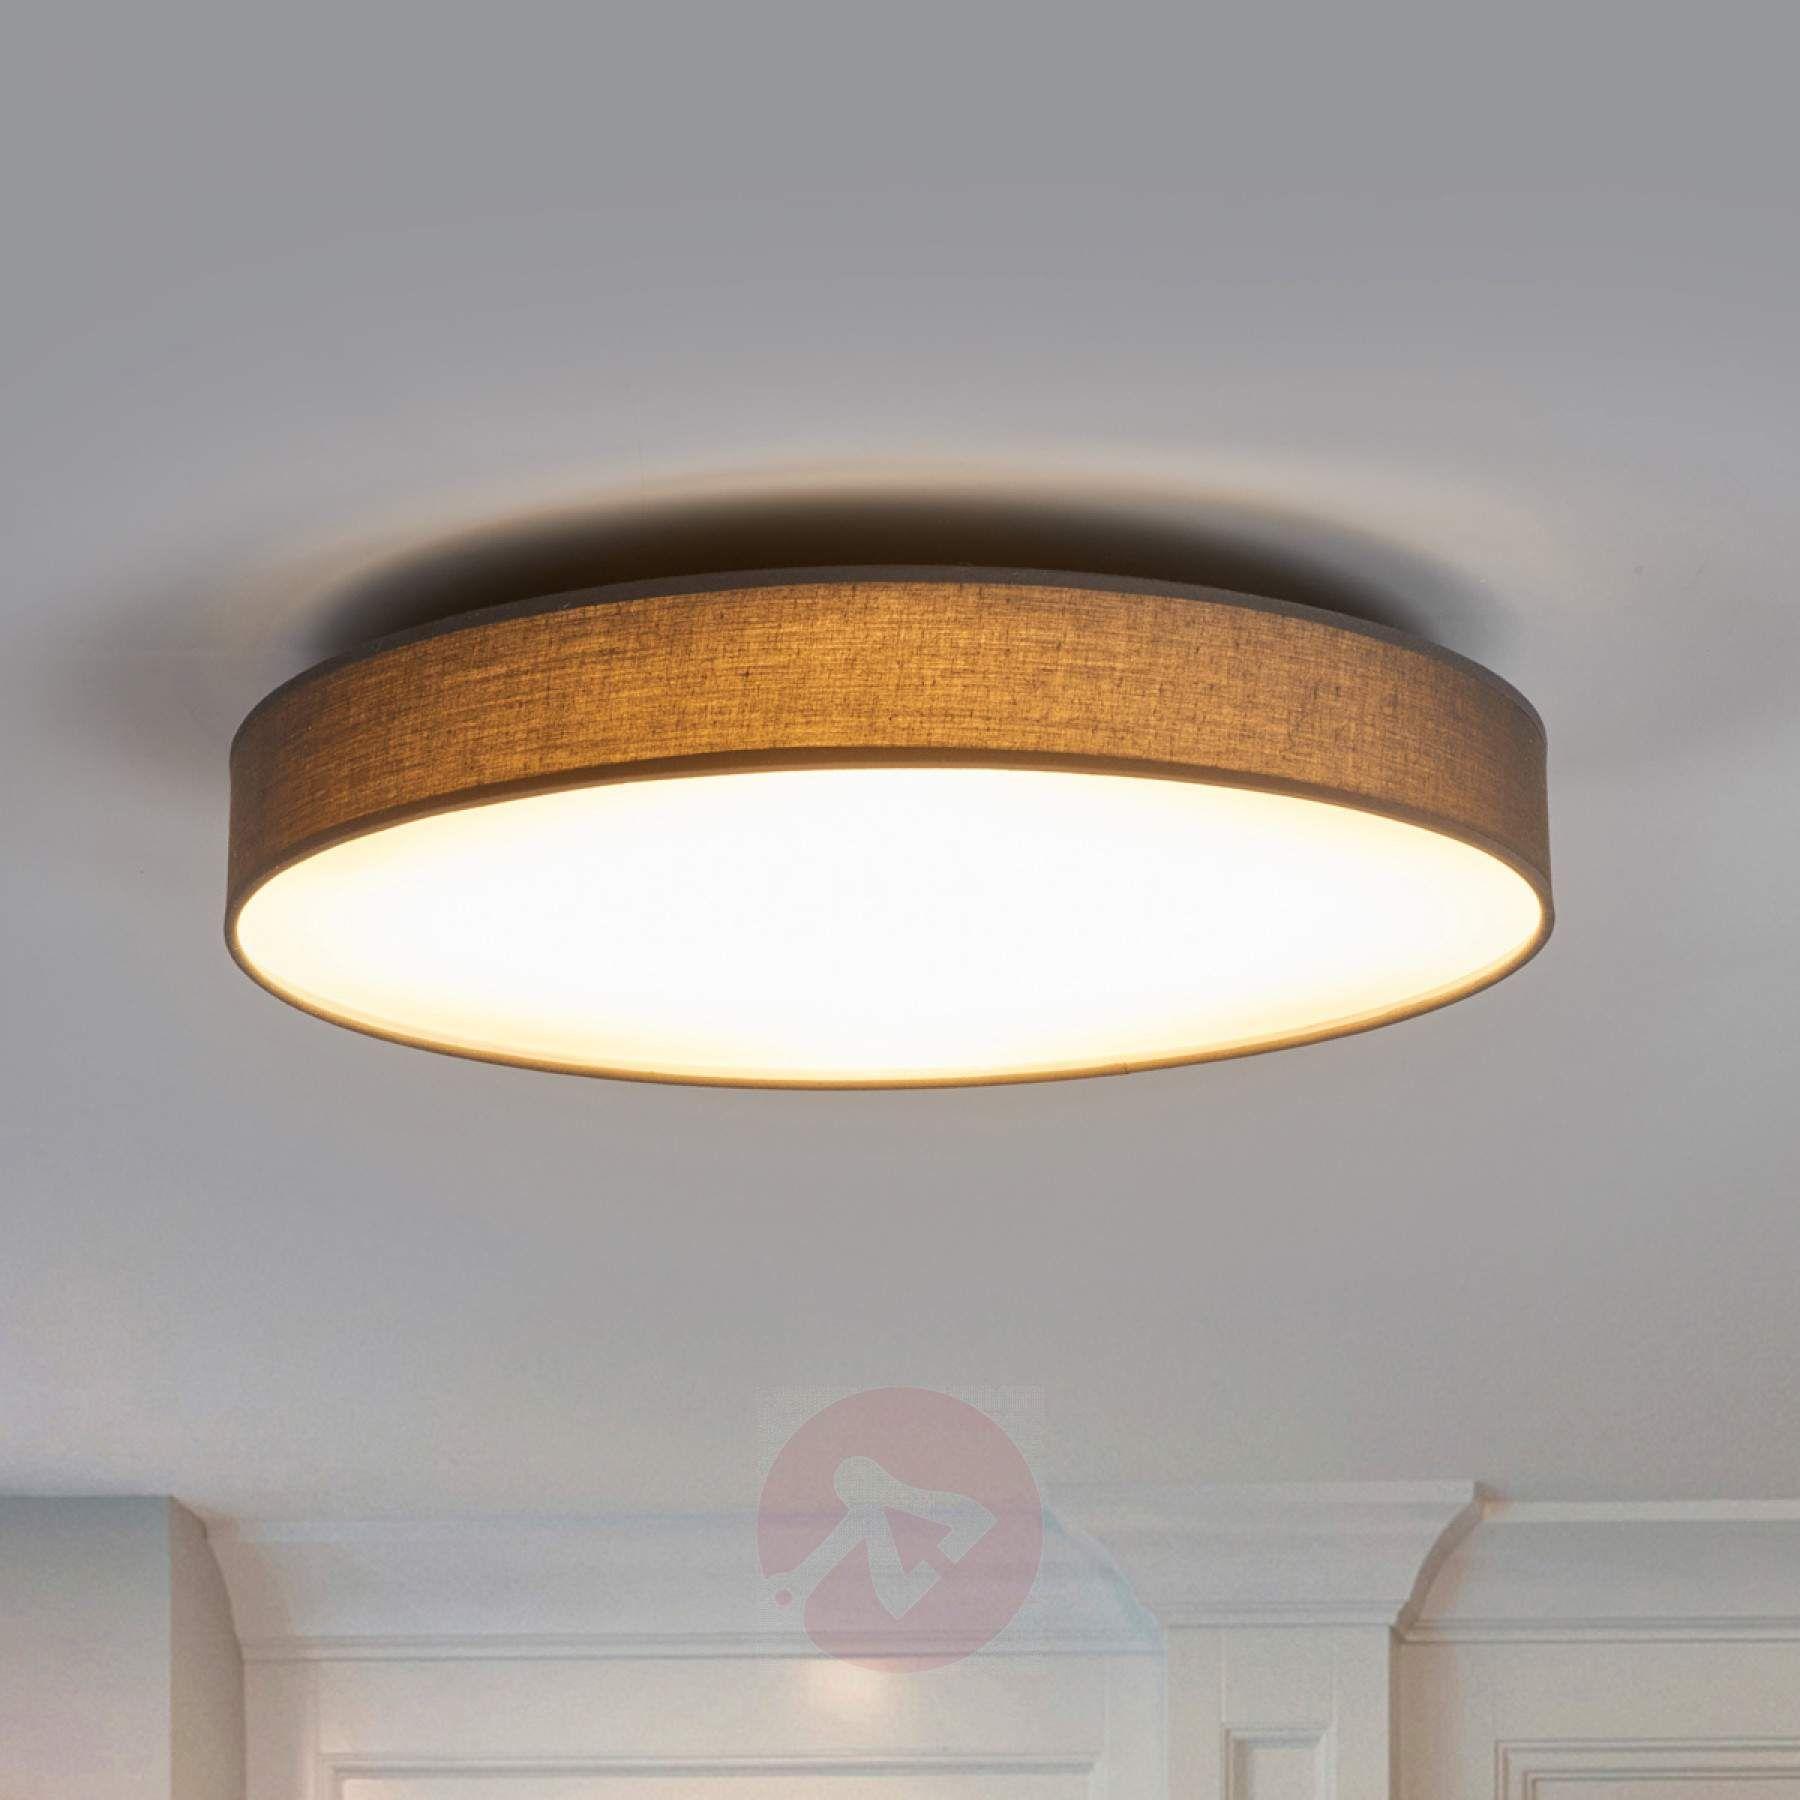 Textil Deckenlampe Saira In Grau Mit Leds 9625094 02